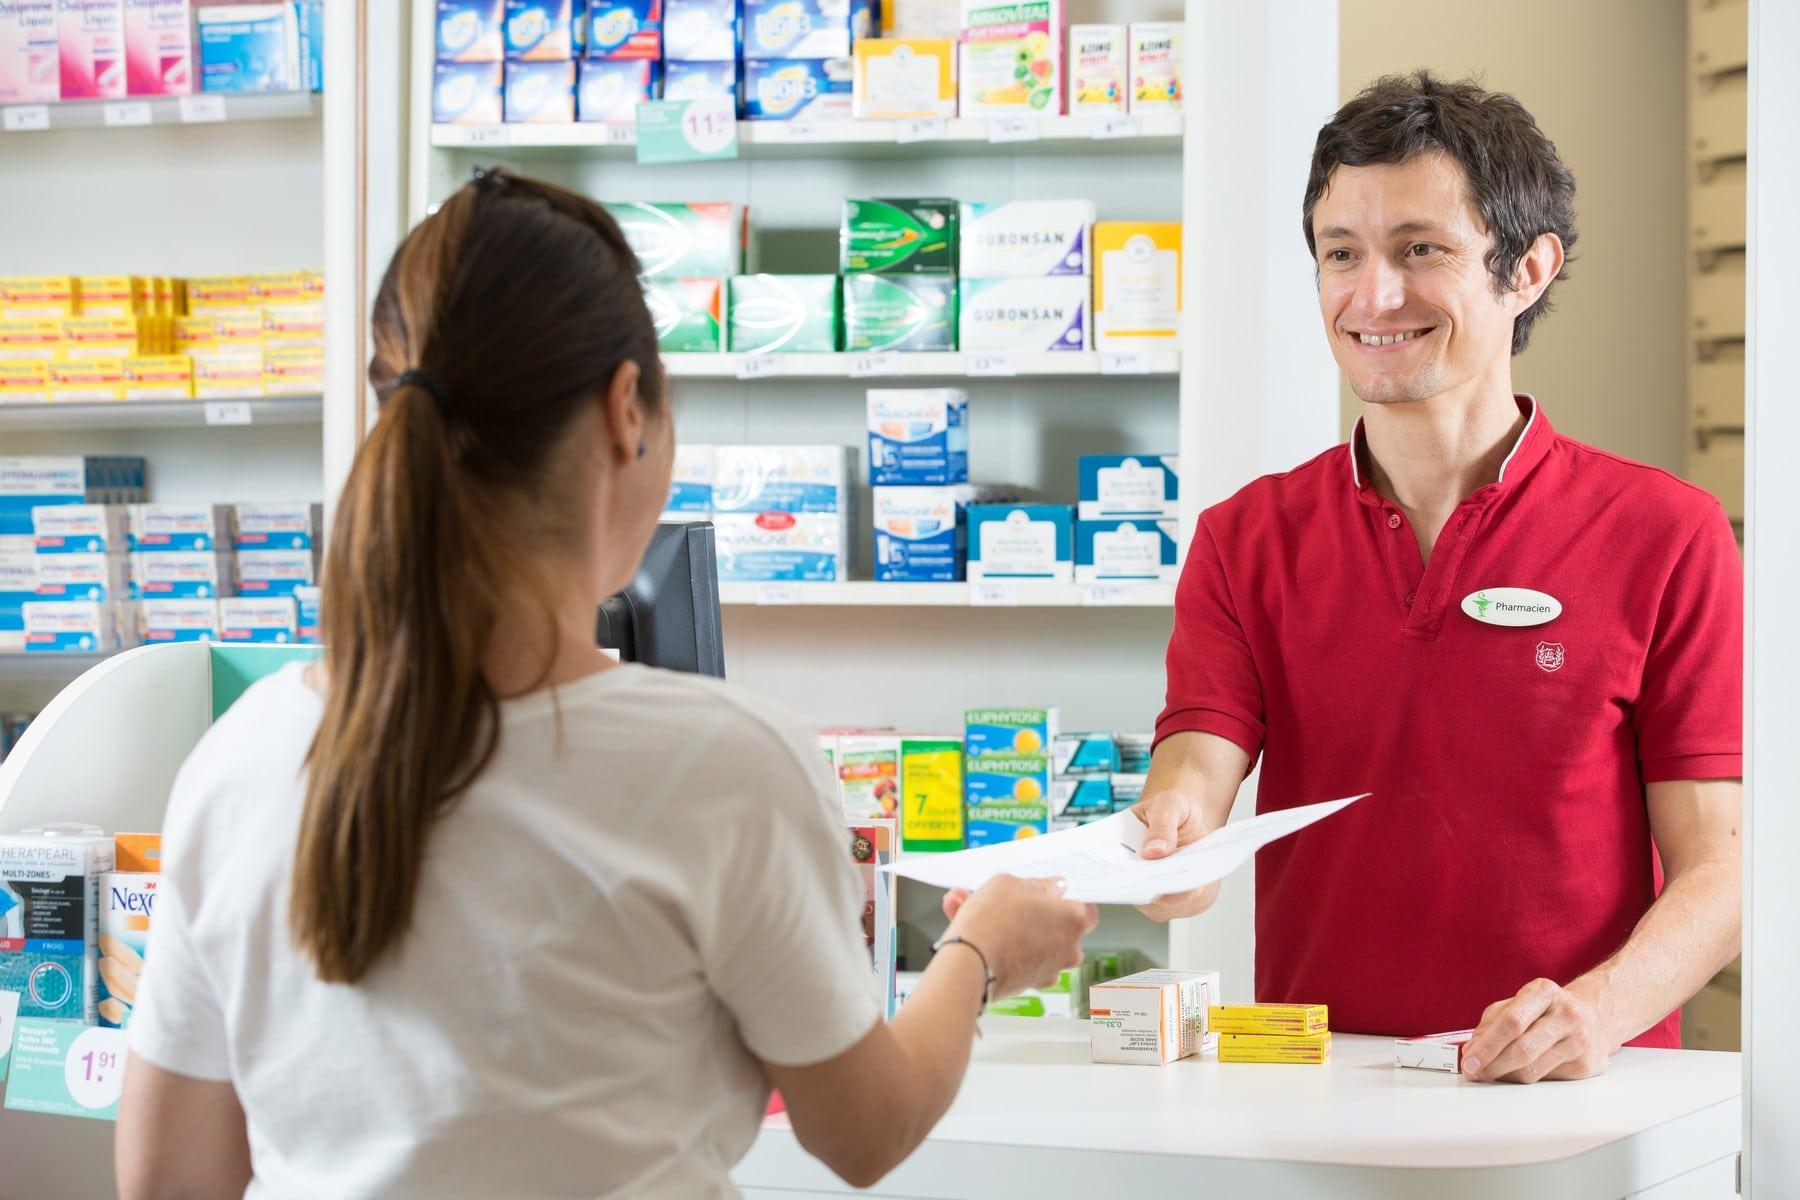 MSP Rillieux Village - La pharmacie